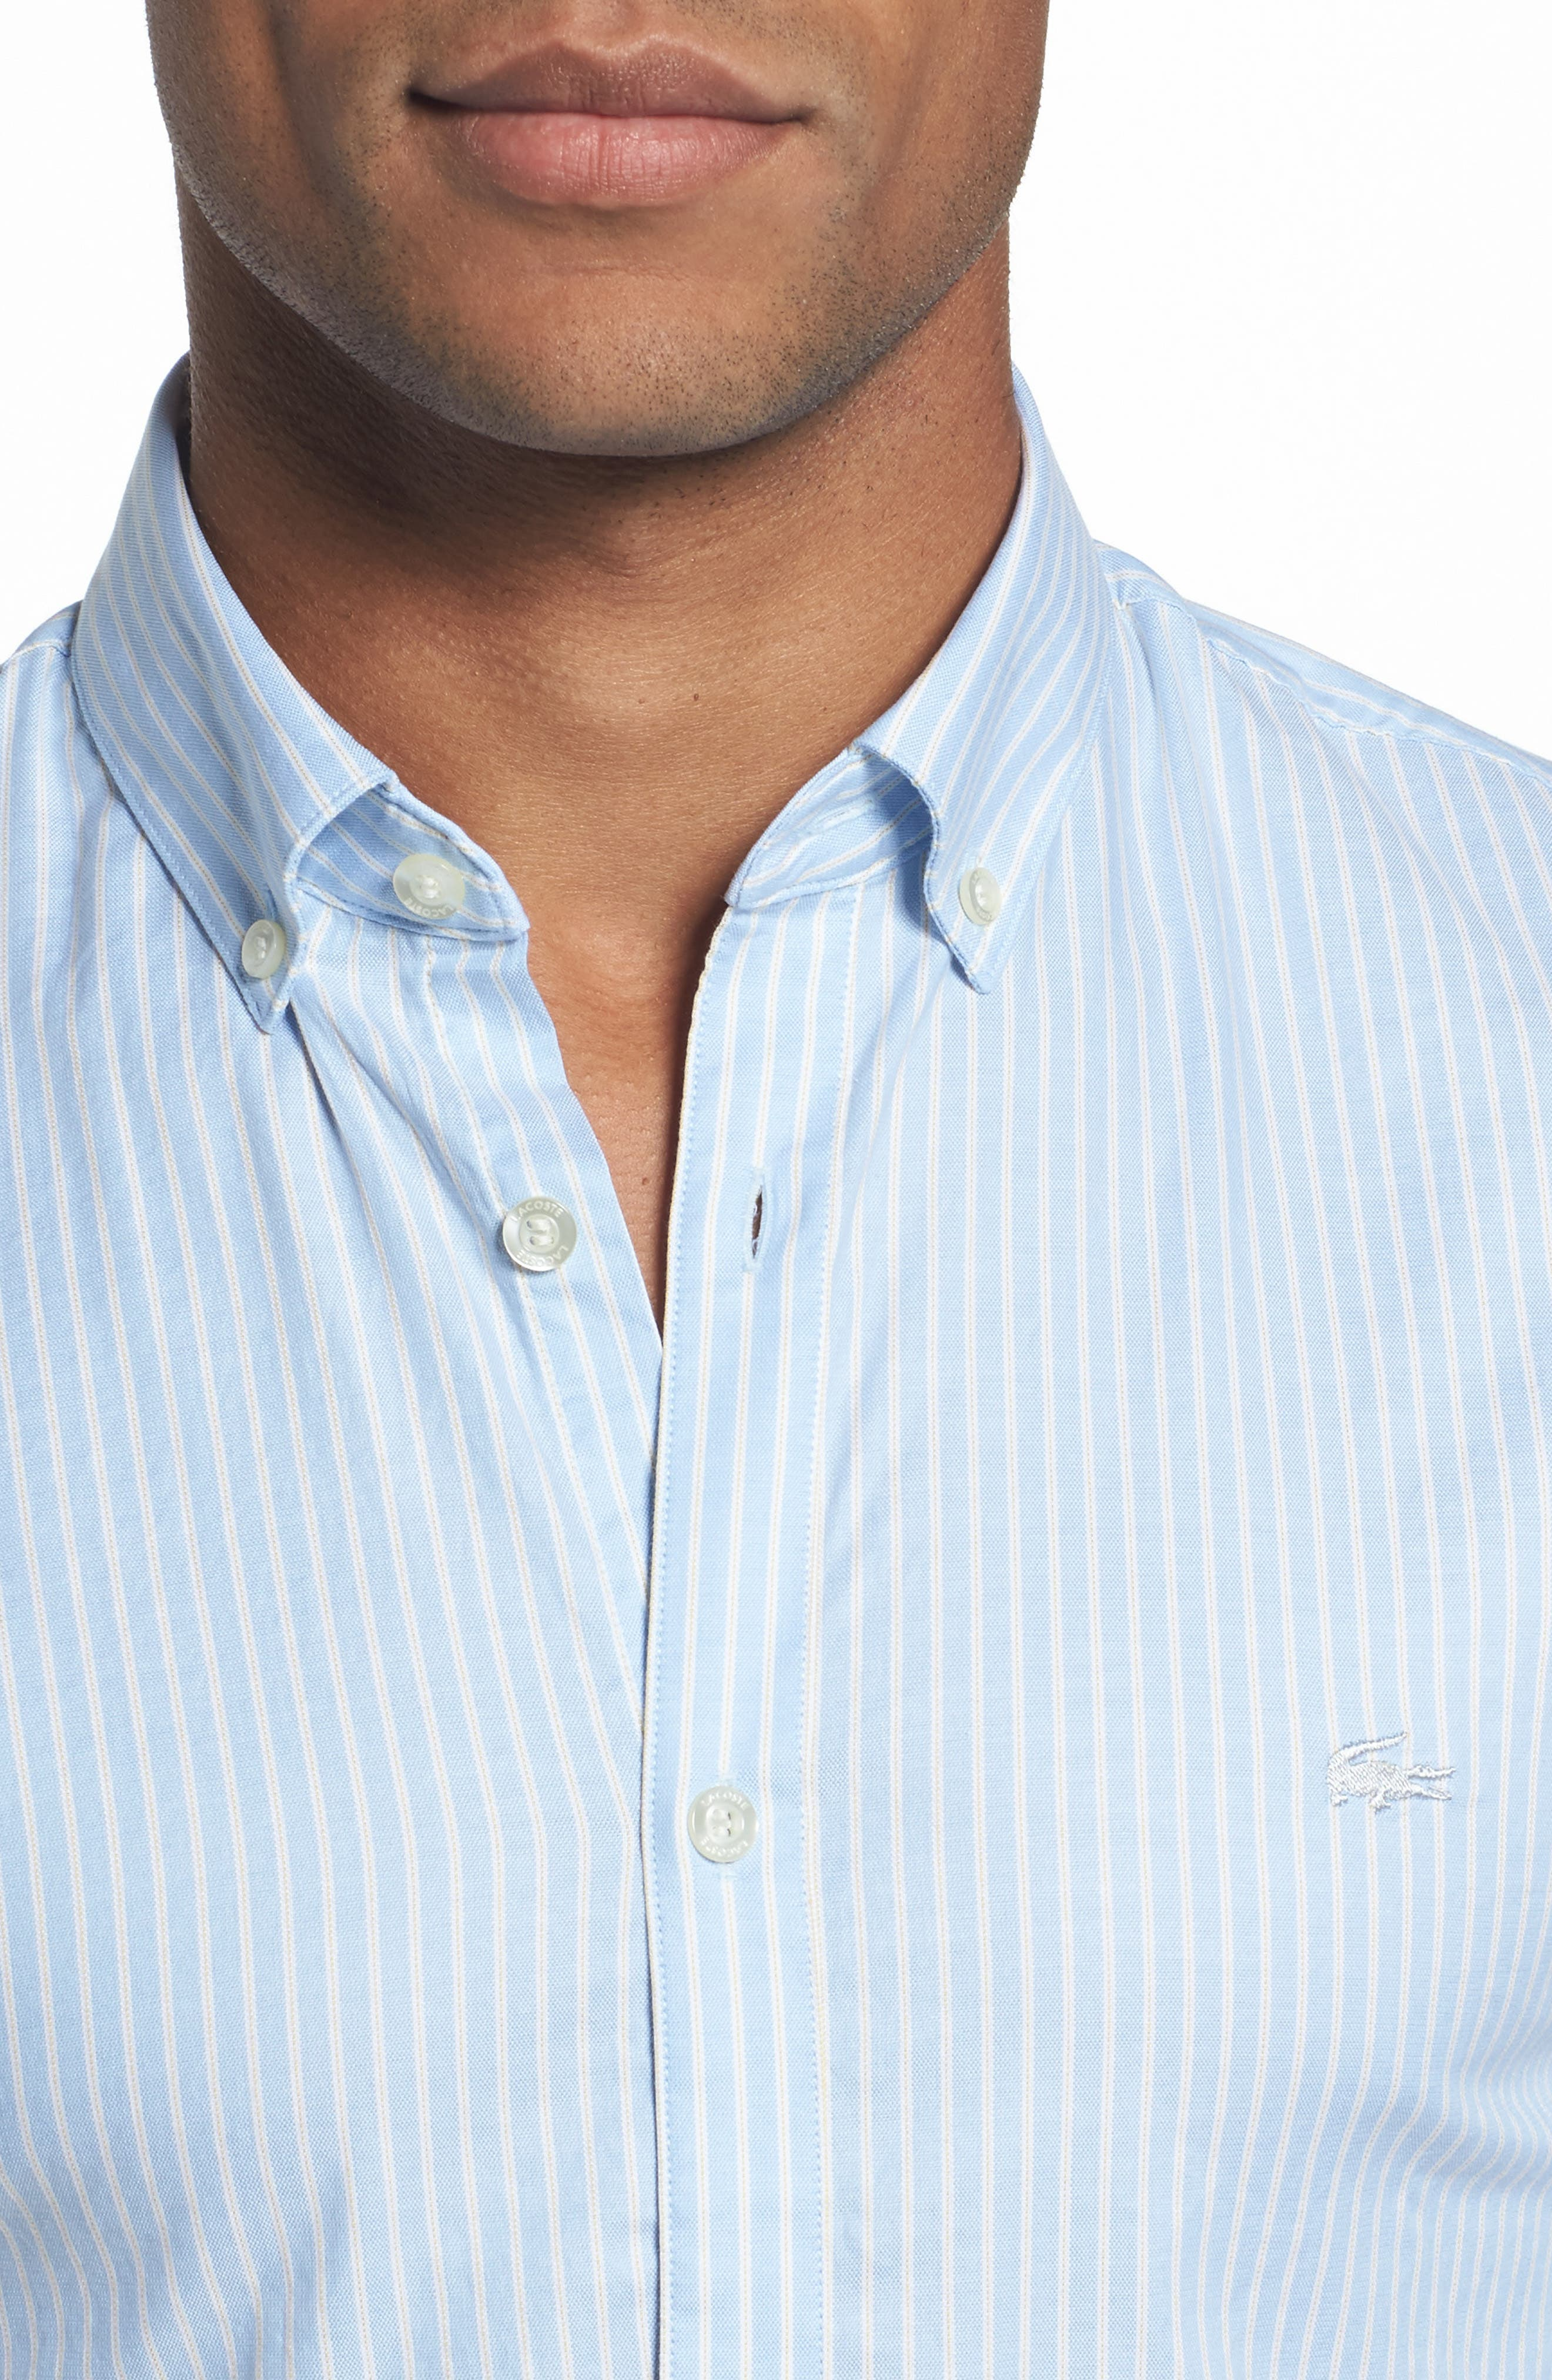 LACOSTE,                             Slim Fit Stripe Shirt,                             Alternate thumbnail 4, color,                             436